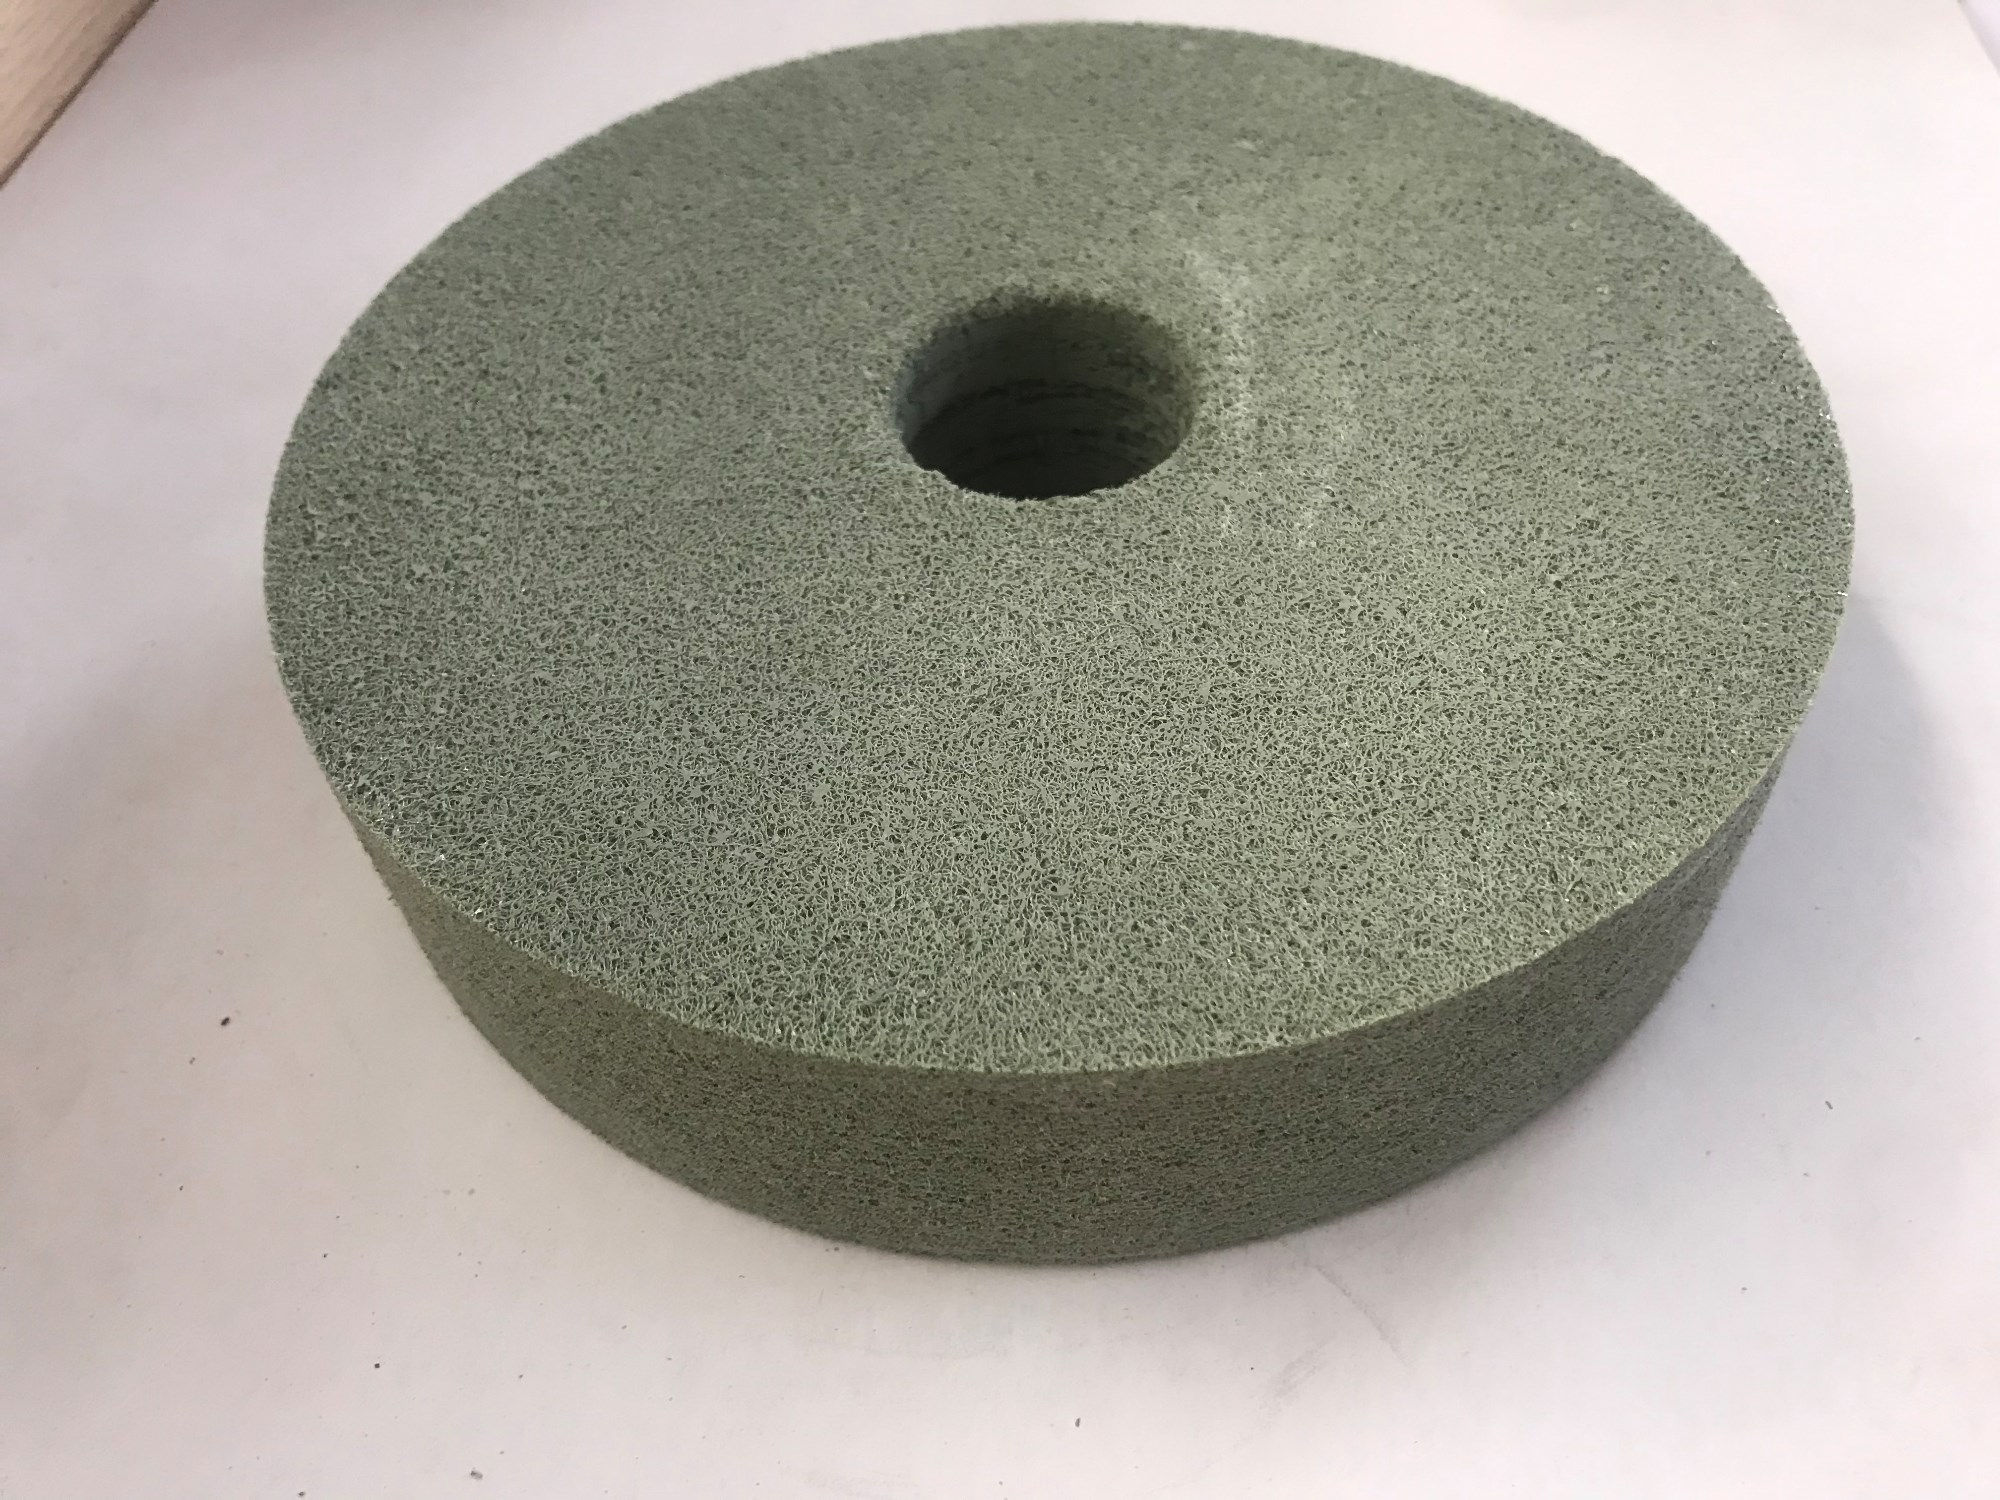 T.30mm Sponge Wheel Manufacturers, T.30mm Sponge Wheel Factory, Supply T.30mm Sponge Wheel